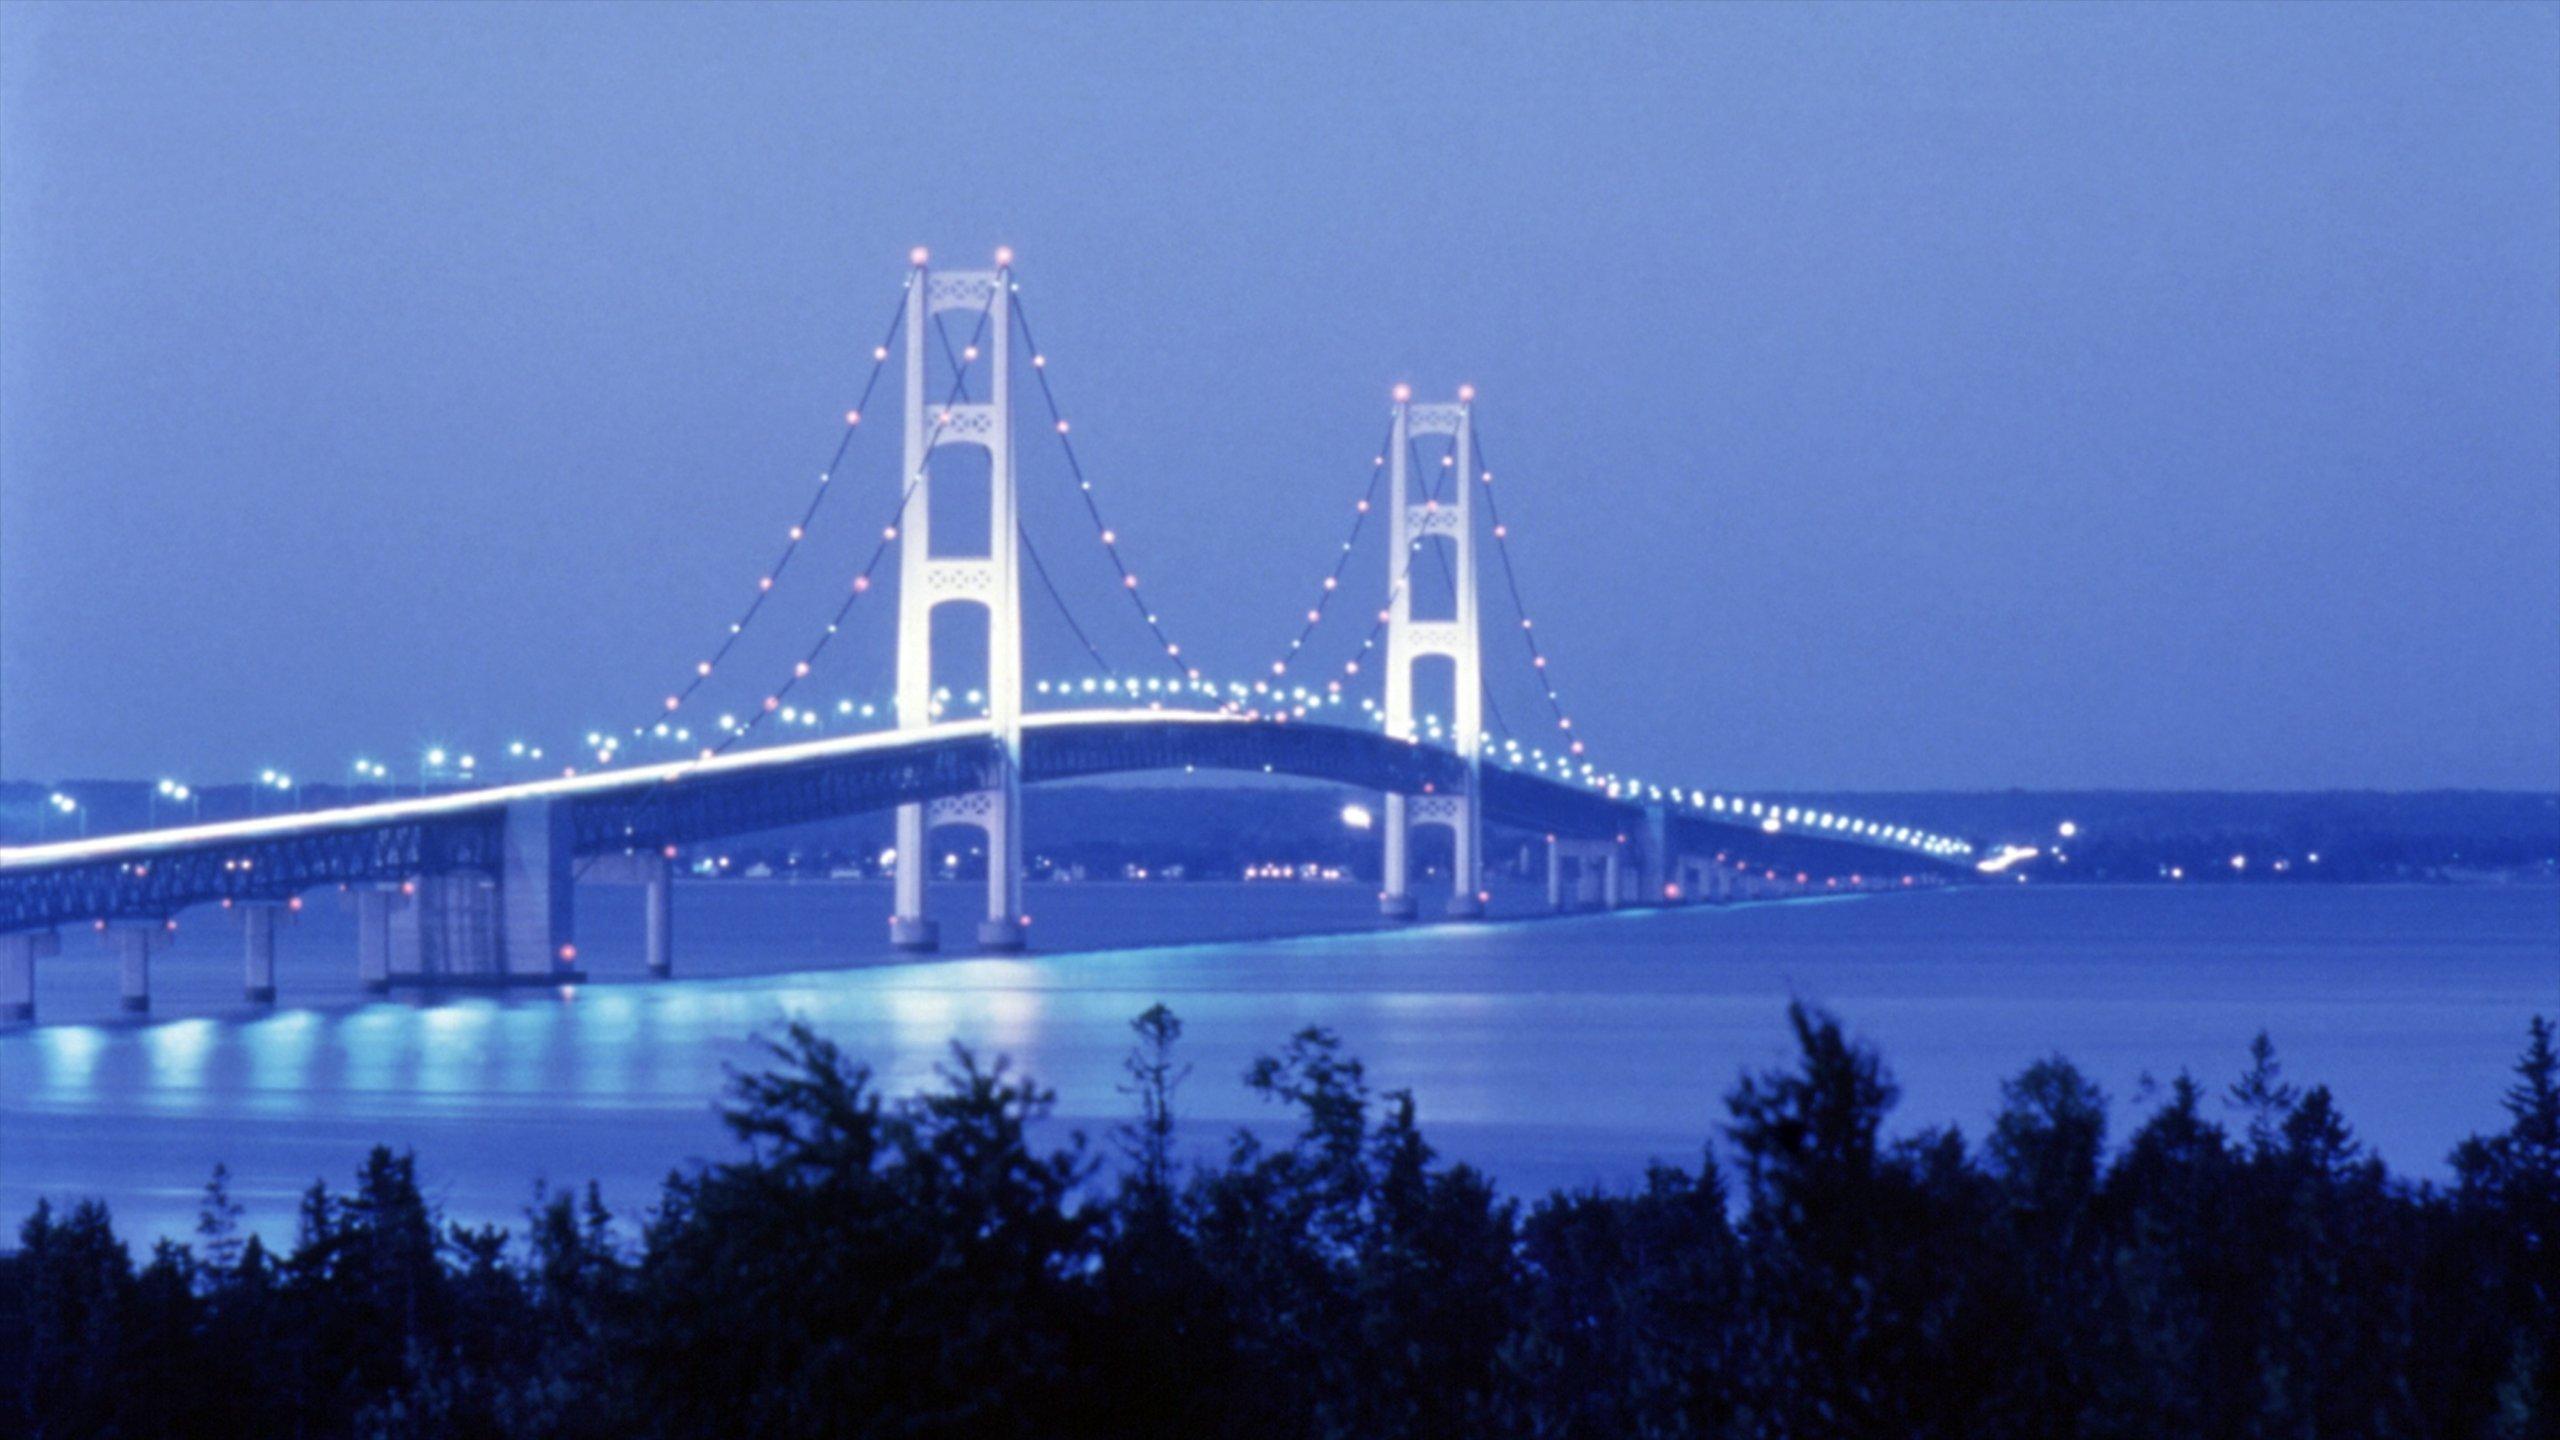 Mackinac County, Michigan, United States of America